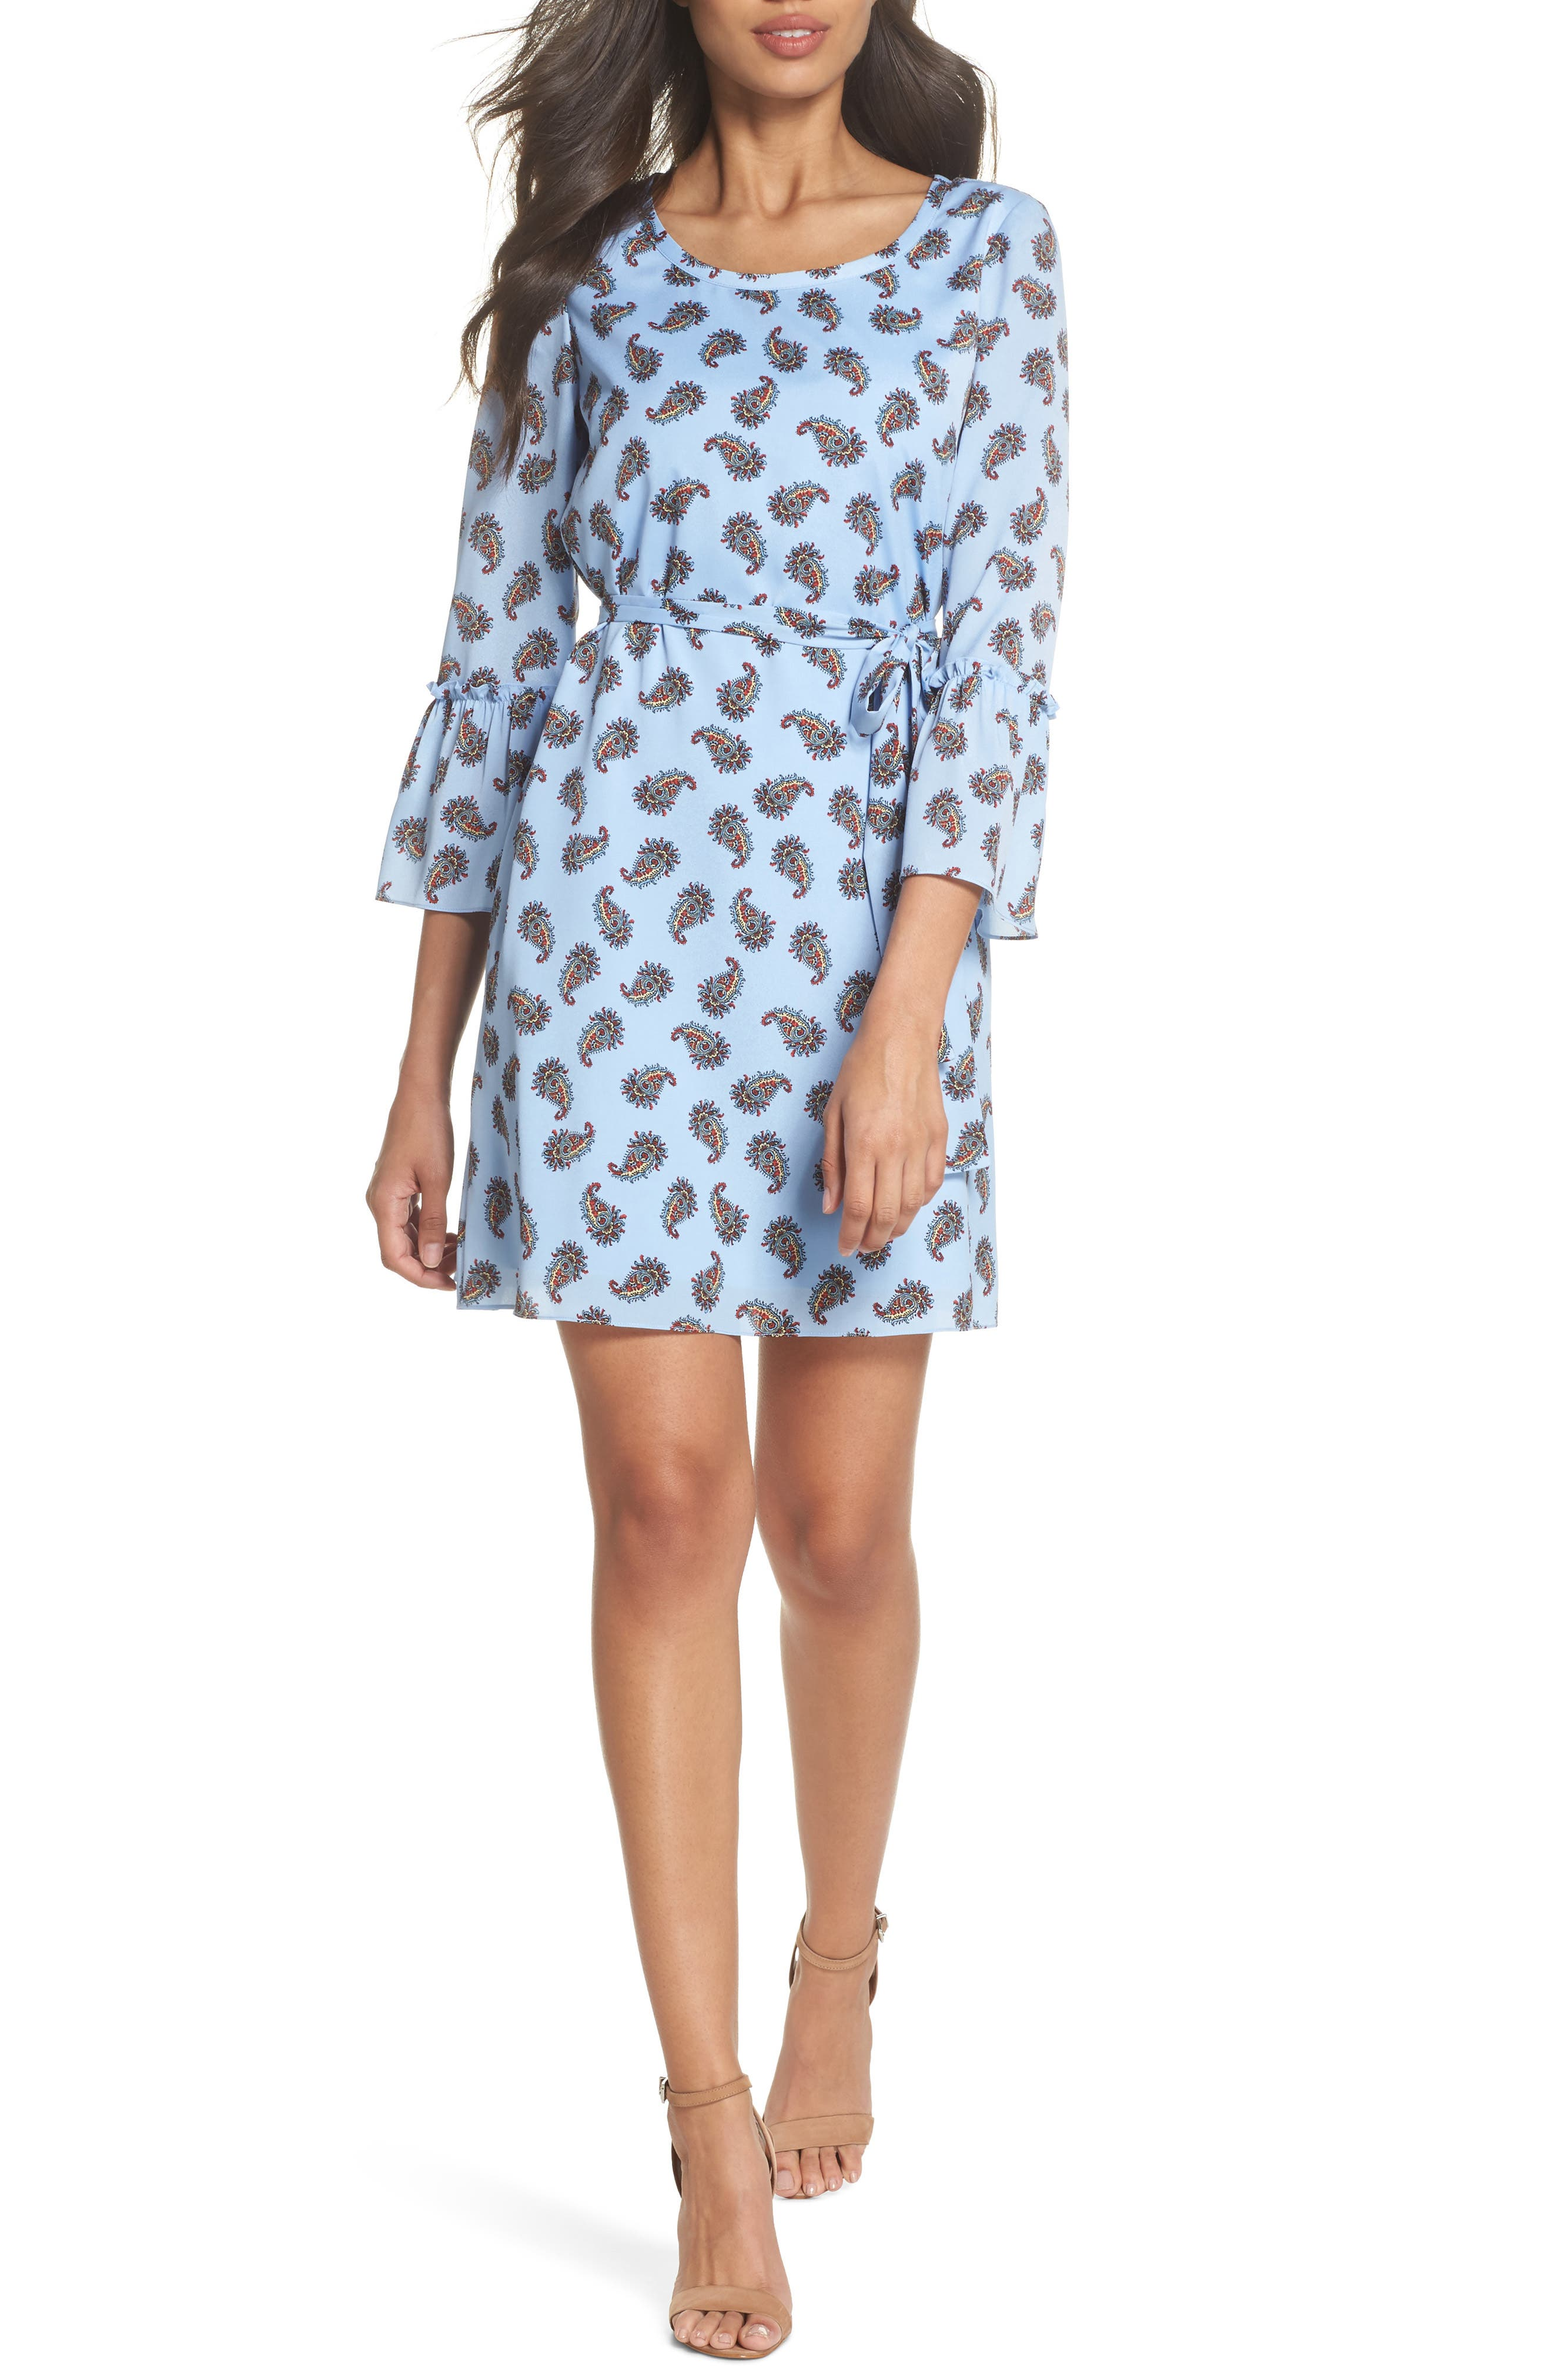 Orli Paisley Print Bell Sleeve Dress,                             Main thumbnail 1, color,                             Blue Multi